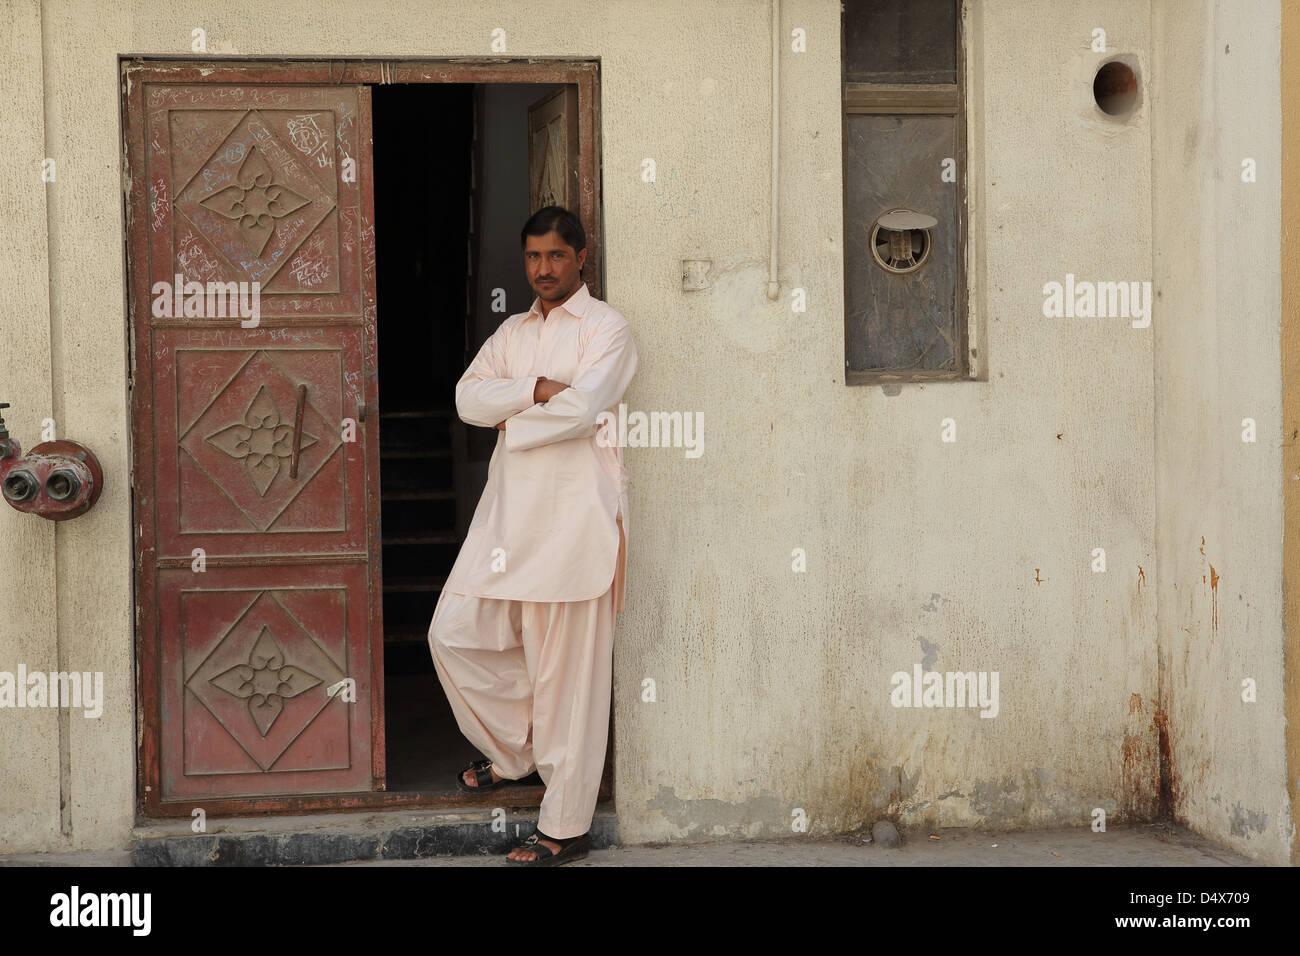 Portrait of man standing in doorway, Dubai, United Arab Emirates - Stock Image